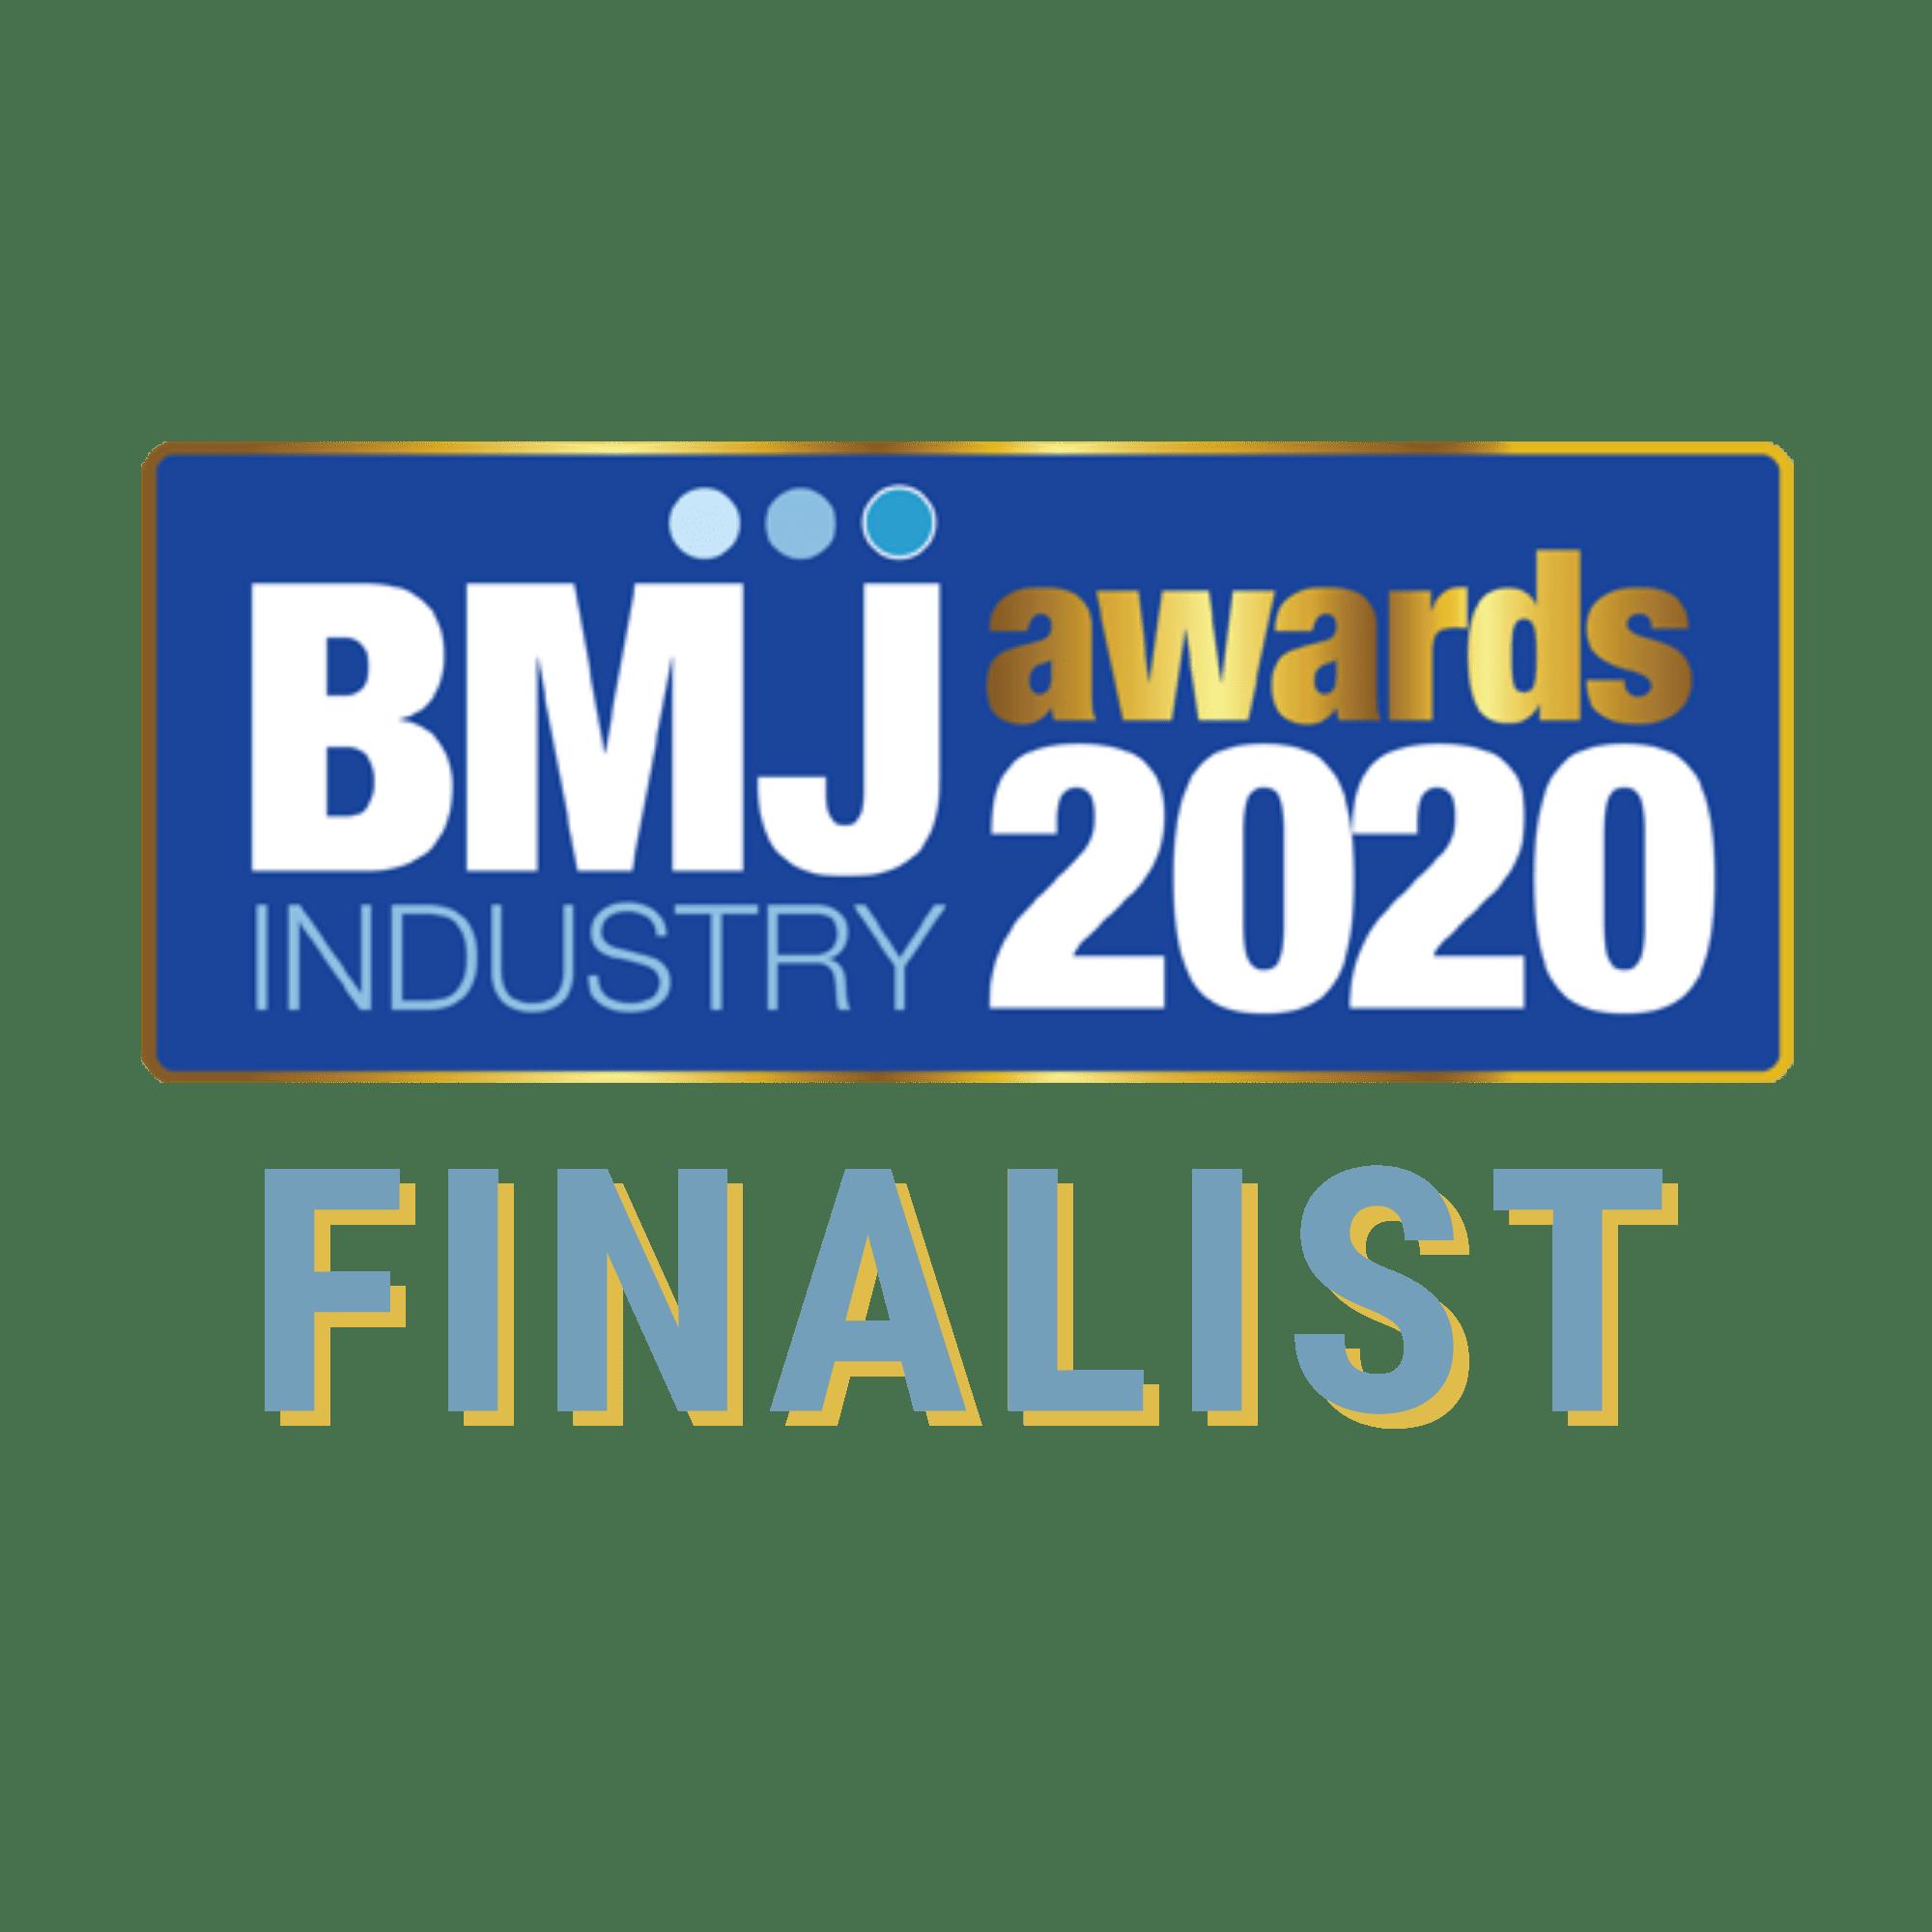 BMJ Awards Finalist 2020